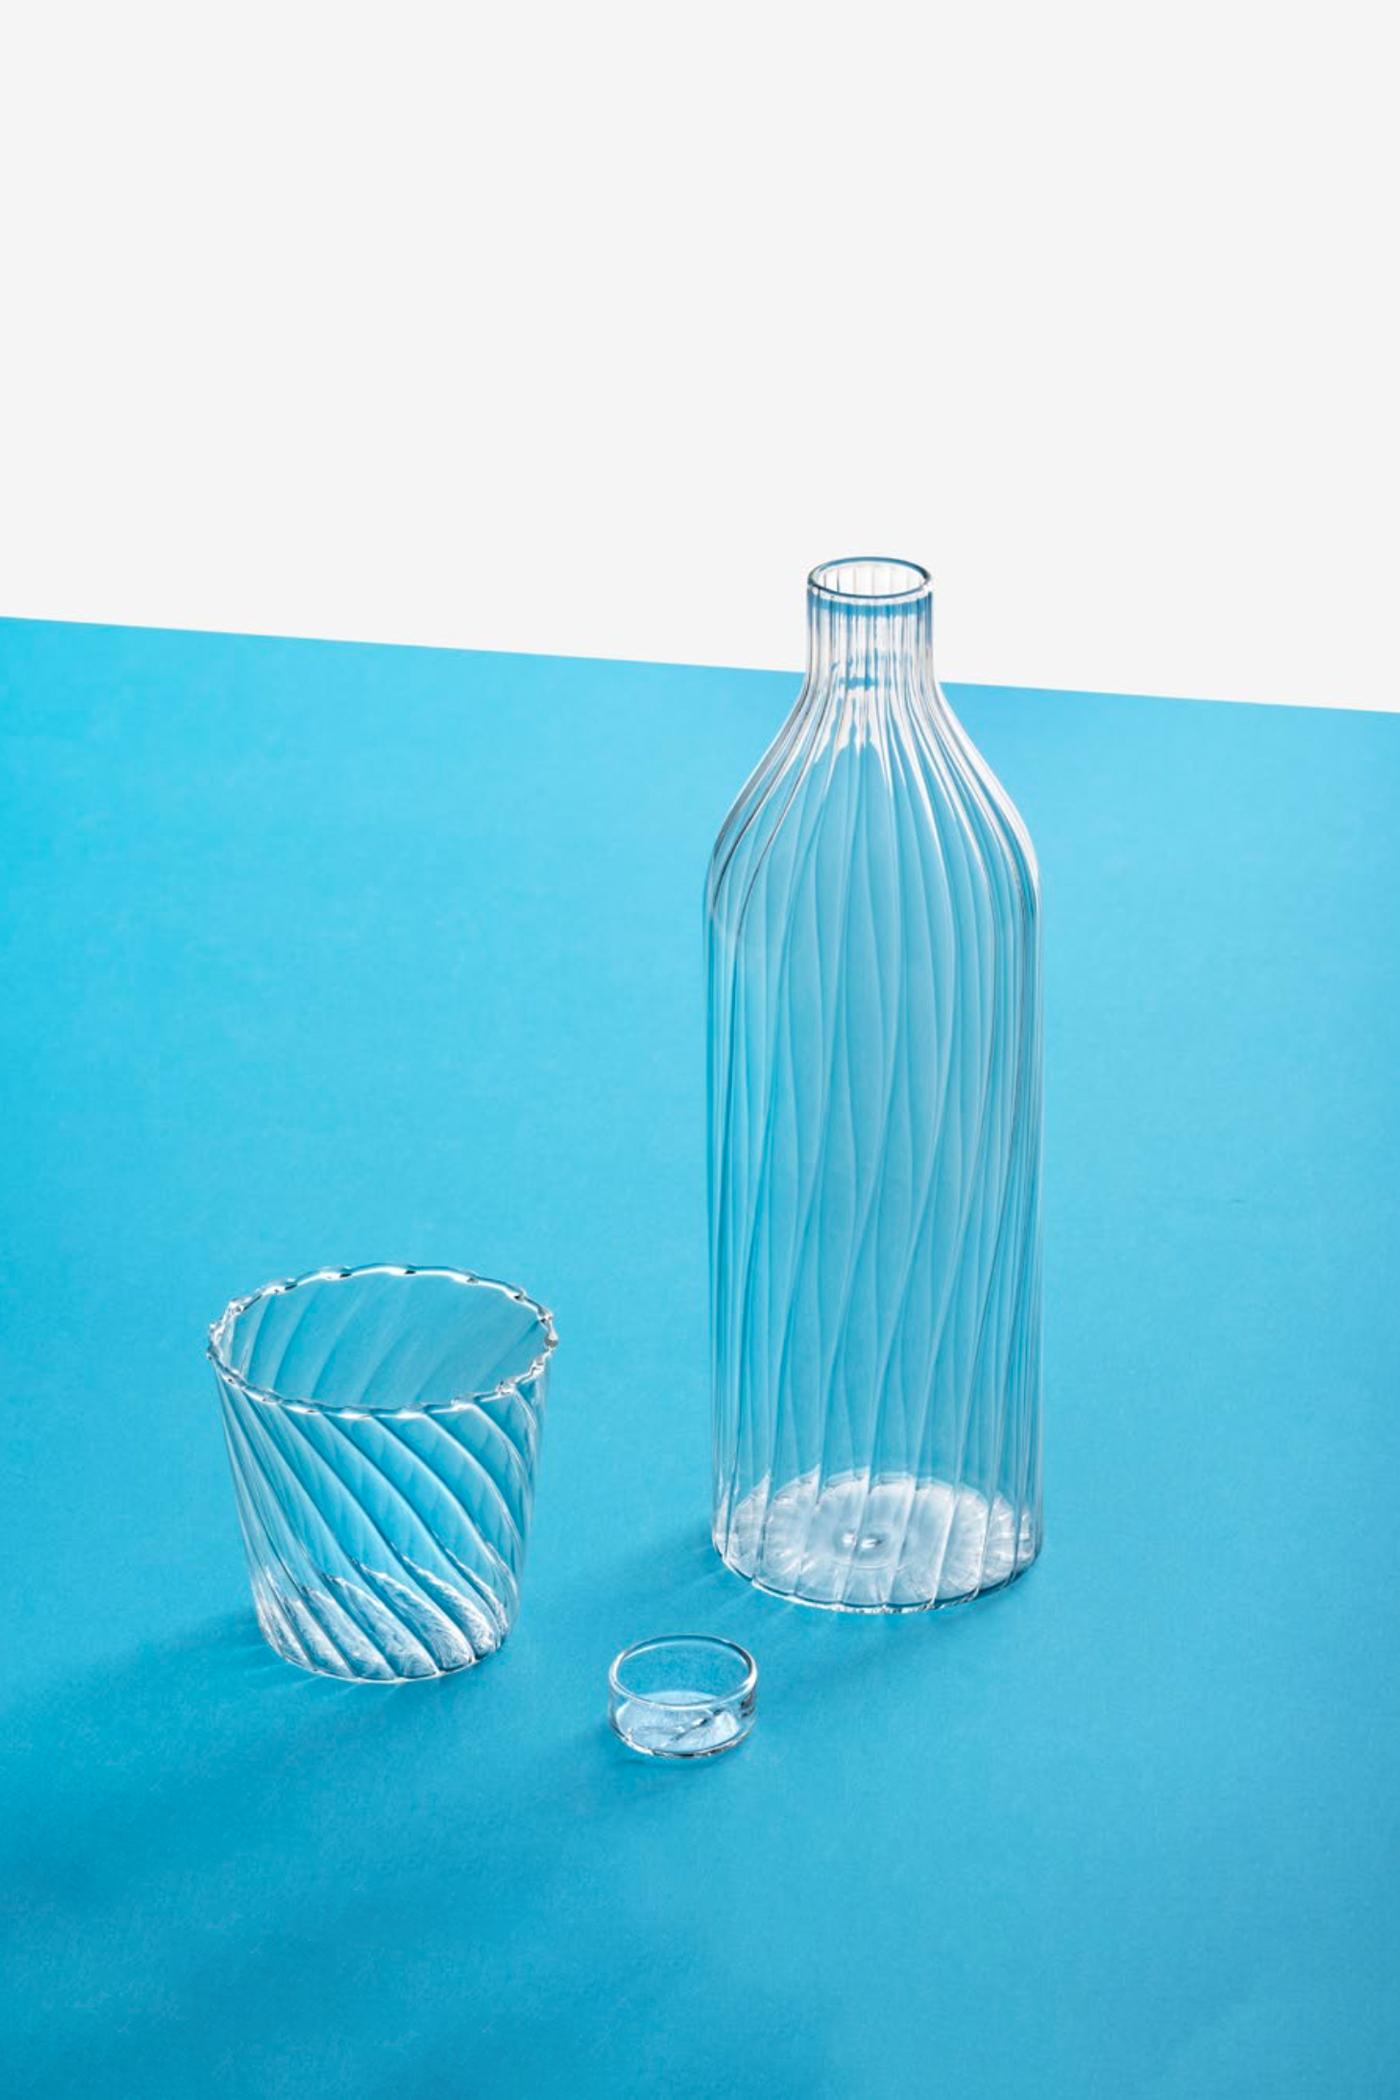 Ichendorf Venezia Ottico Bottle With Lid